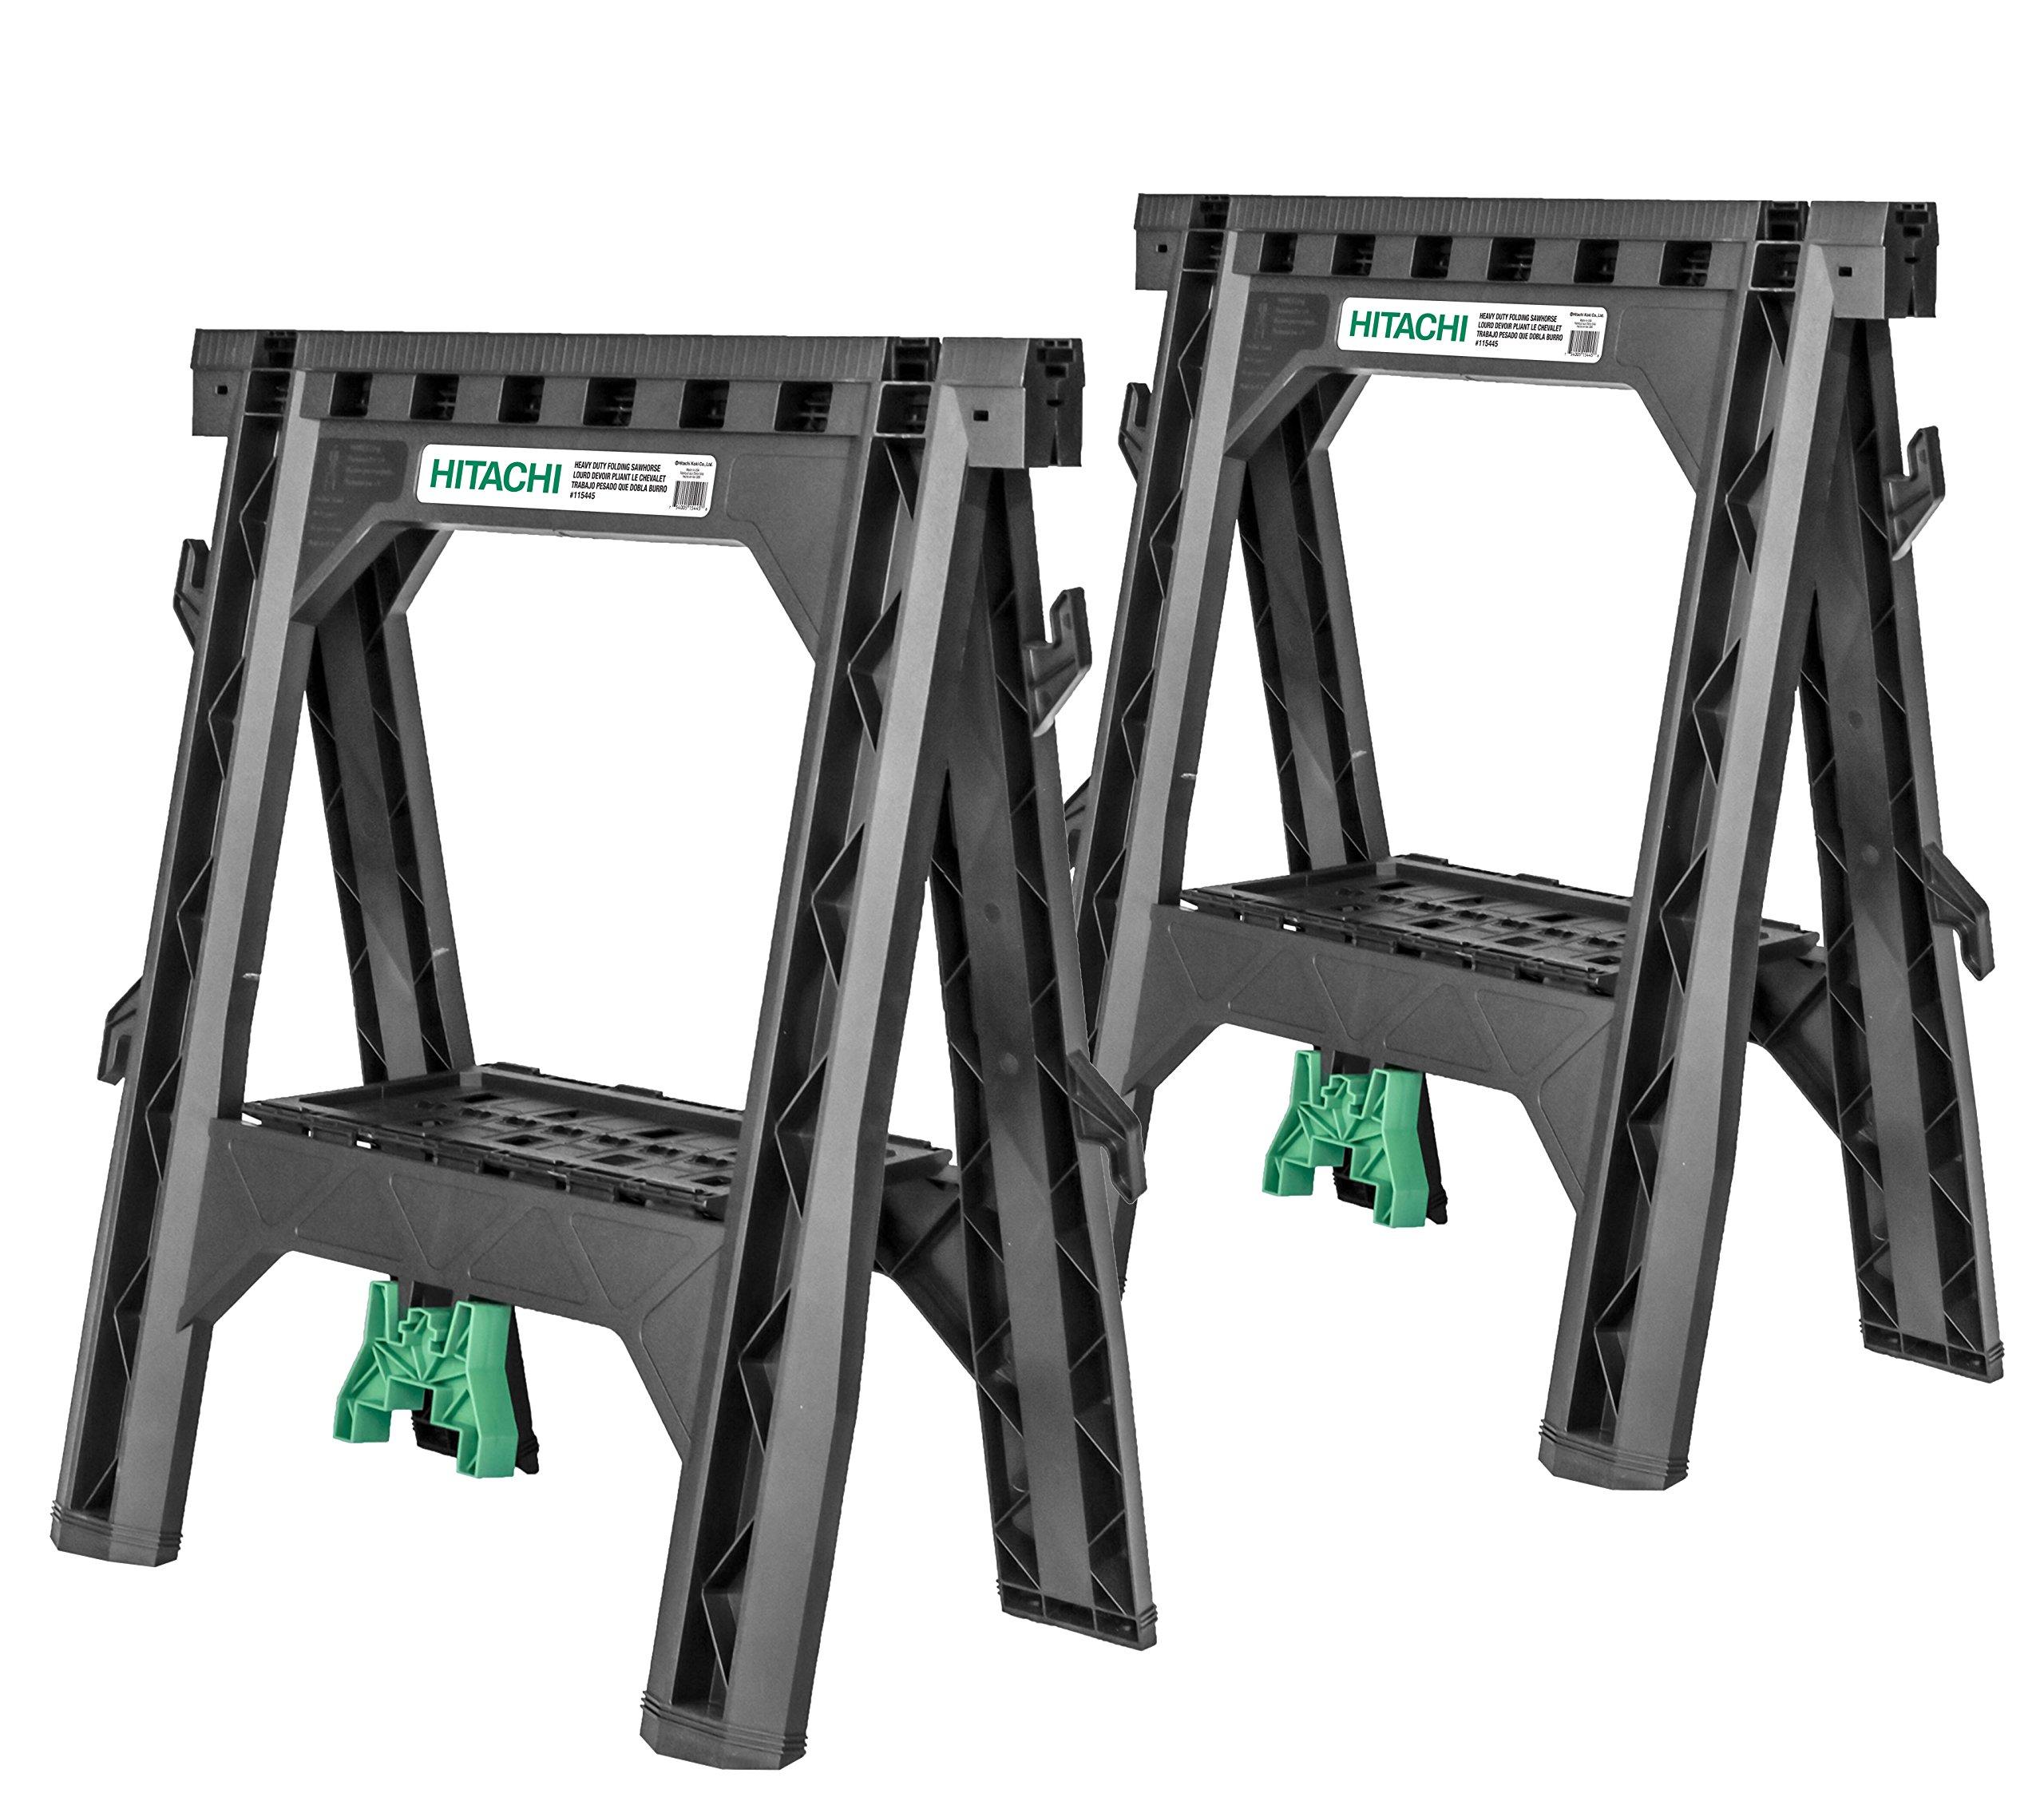 Hitachi 115445 Folding Sawhorses, Heavy Duty Stand, 4 Sawbucks, 1,200 lb Capacity, 2 Pack by Hitachi